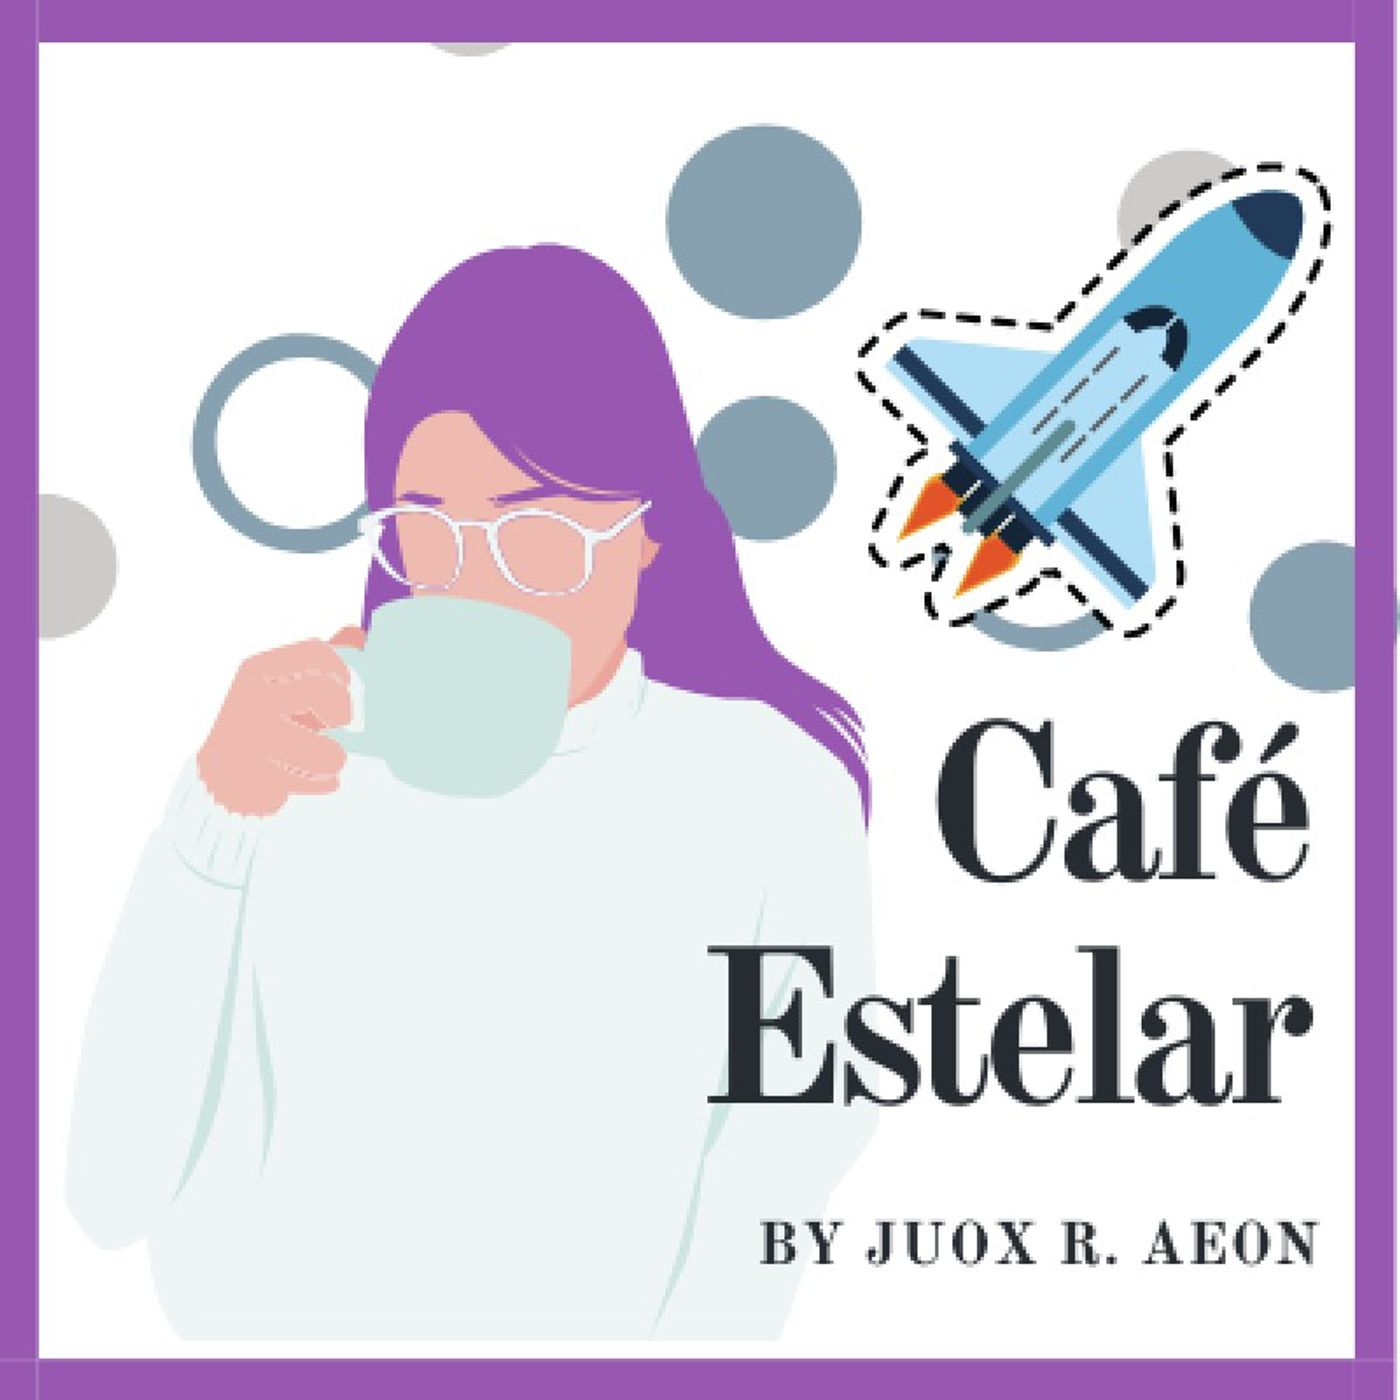 Café Estelar: Cenando cebollas